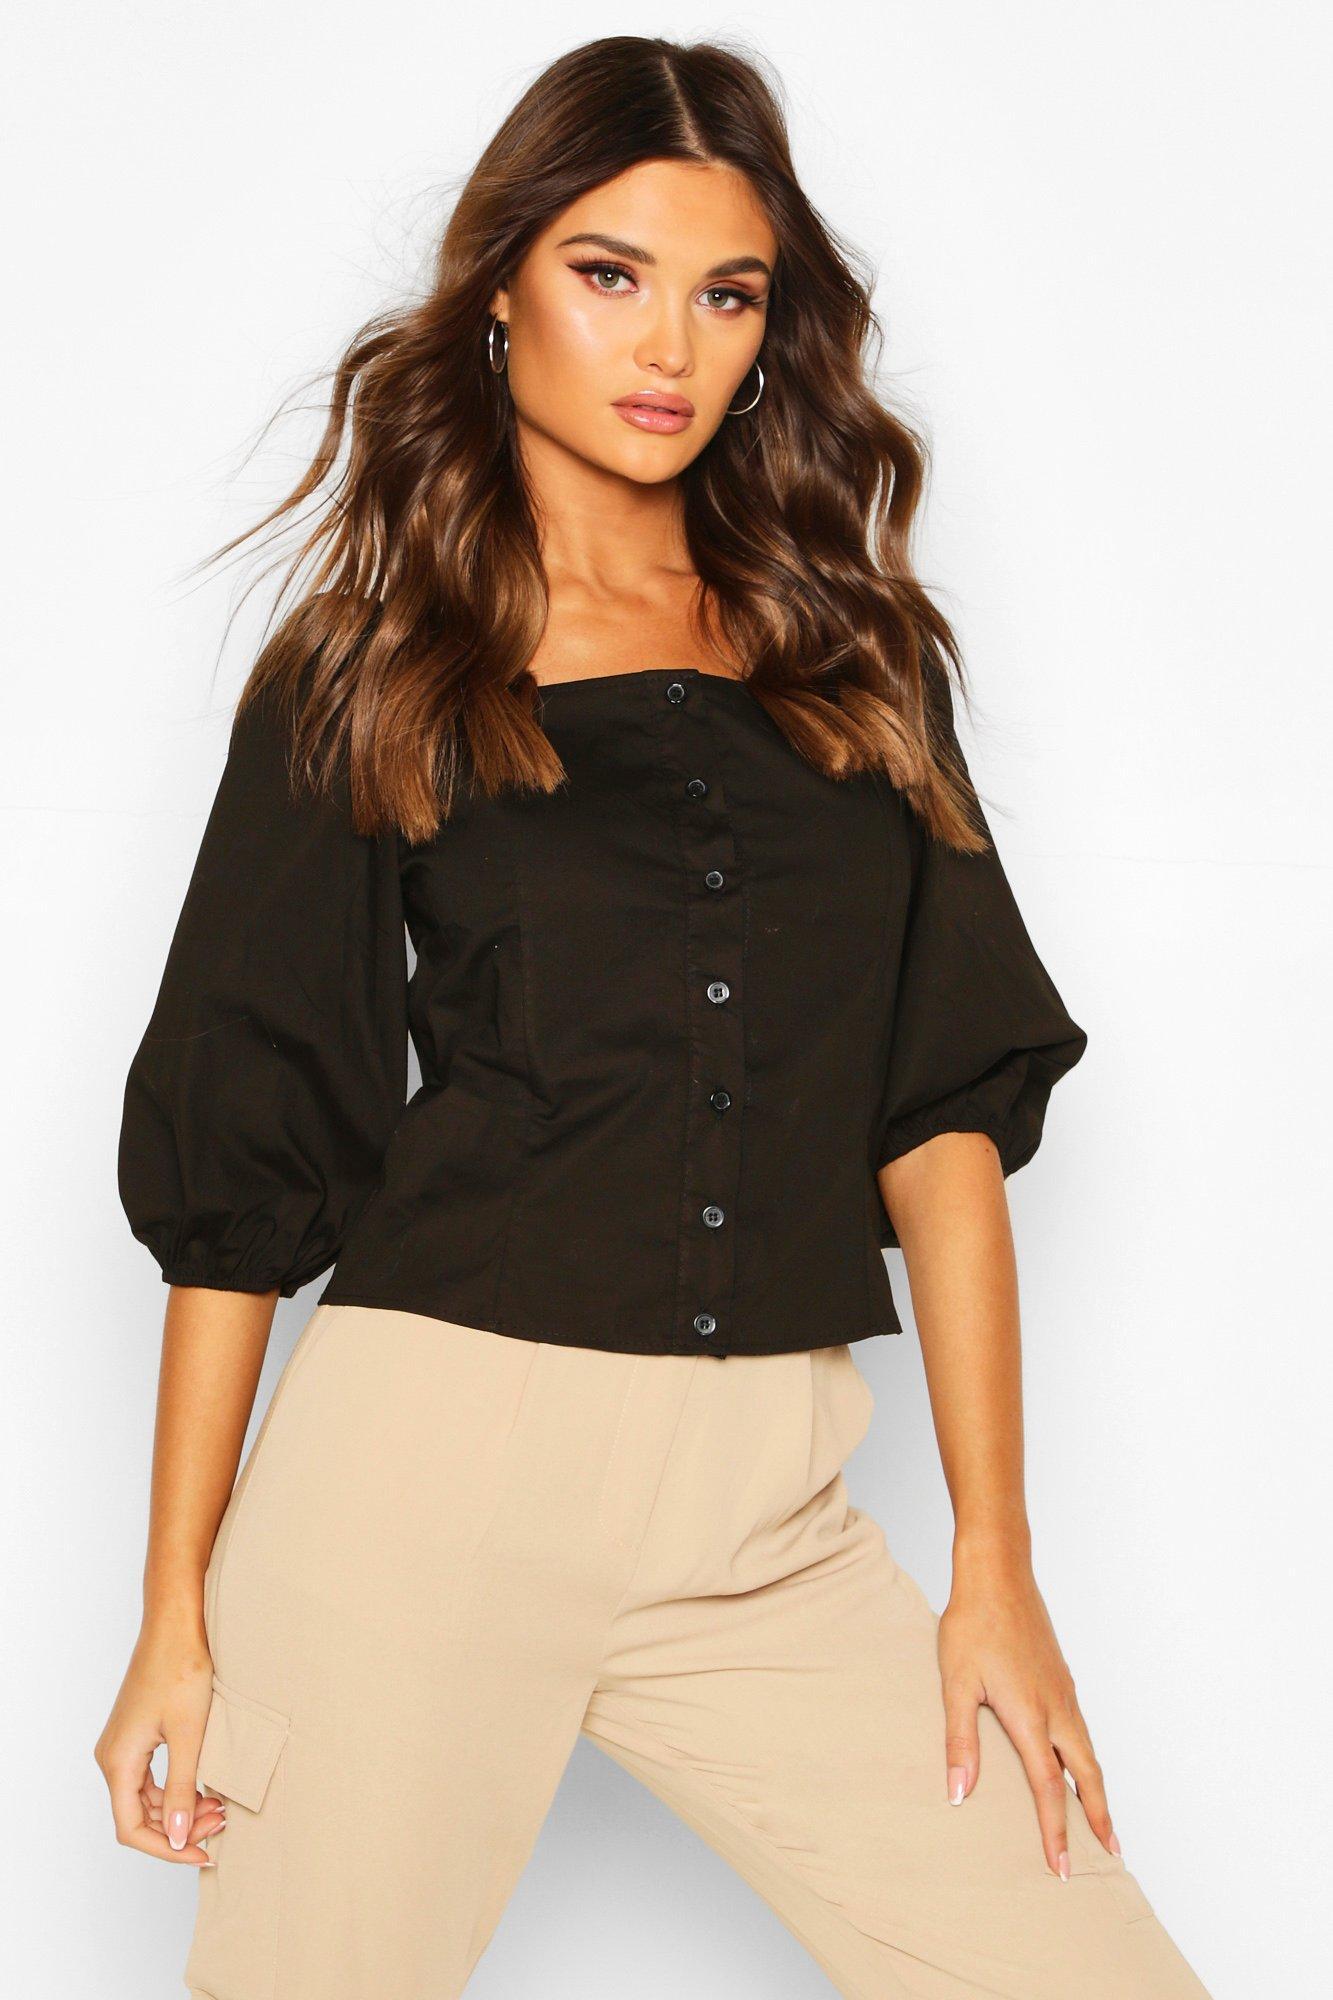 Womens Square Neck Puff Sleeve Blouse - black - 32, Black - Boohoo.com